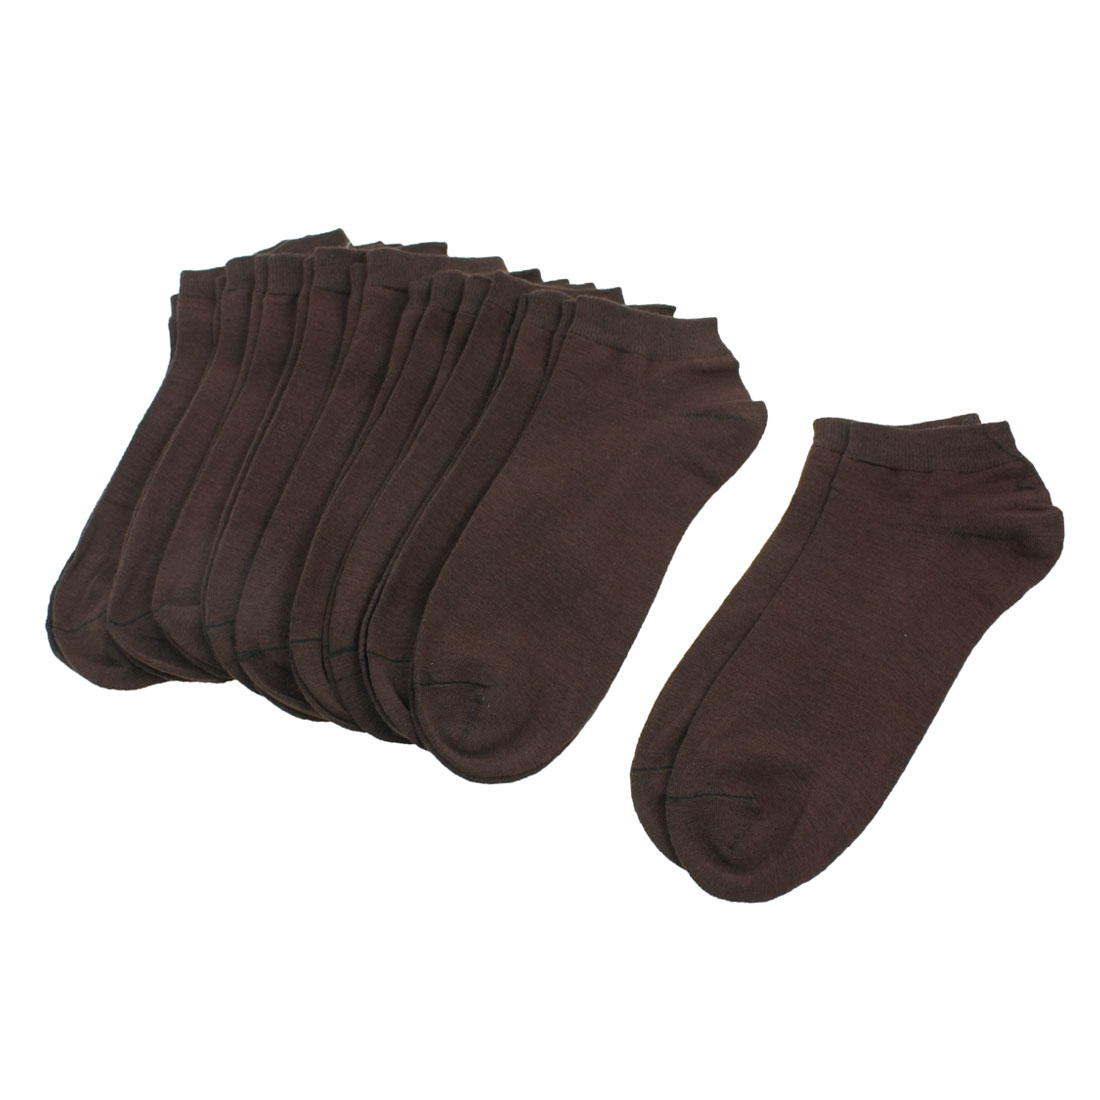 Man Men Elastic Cuff Textured Low Cut Sheer Socks Coffee Color 10 Pairs